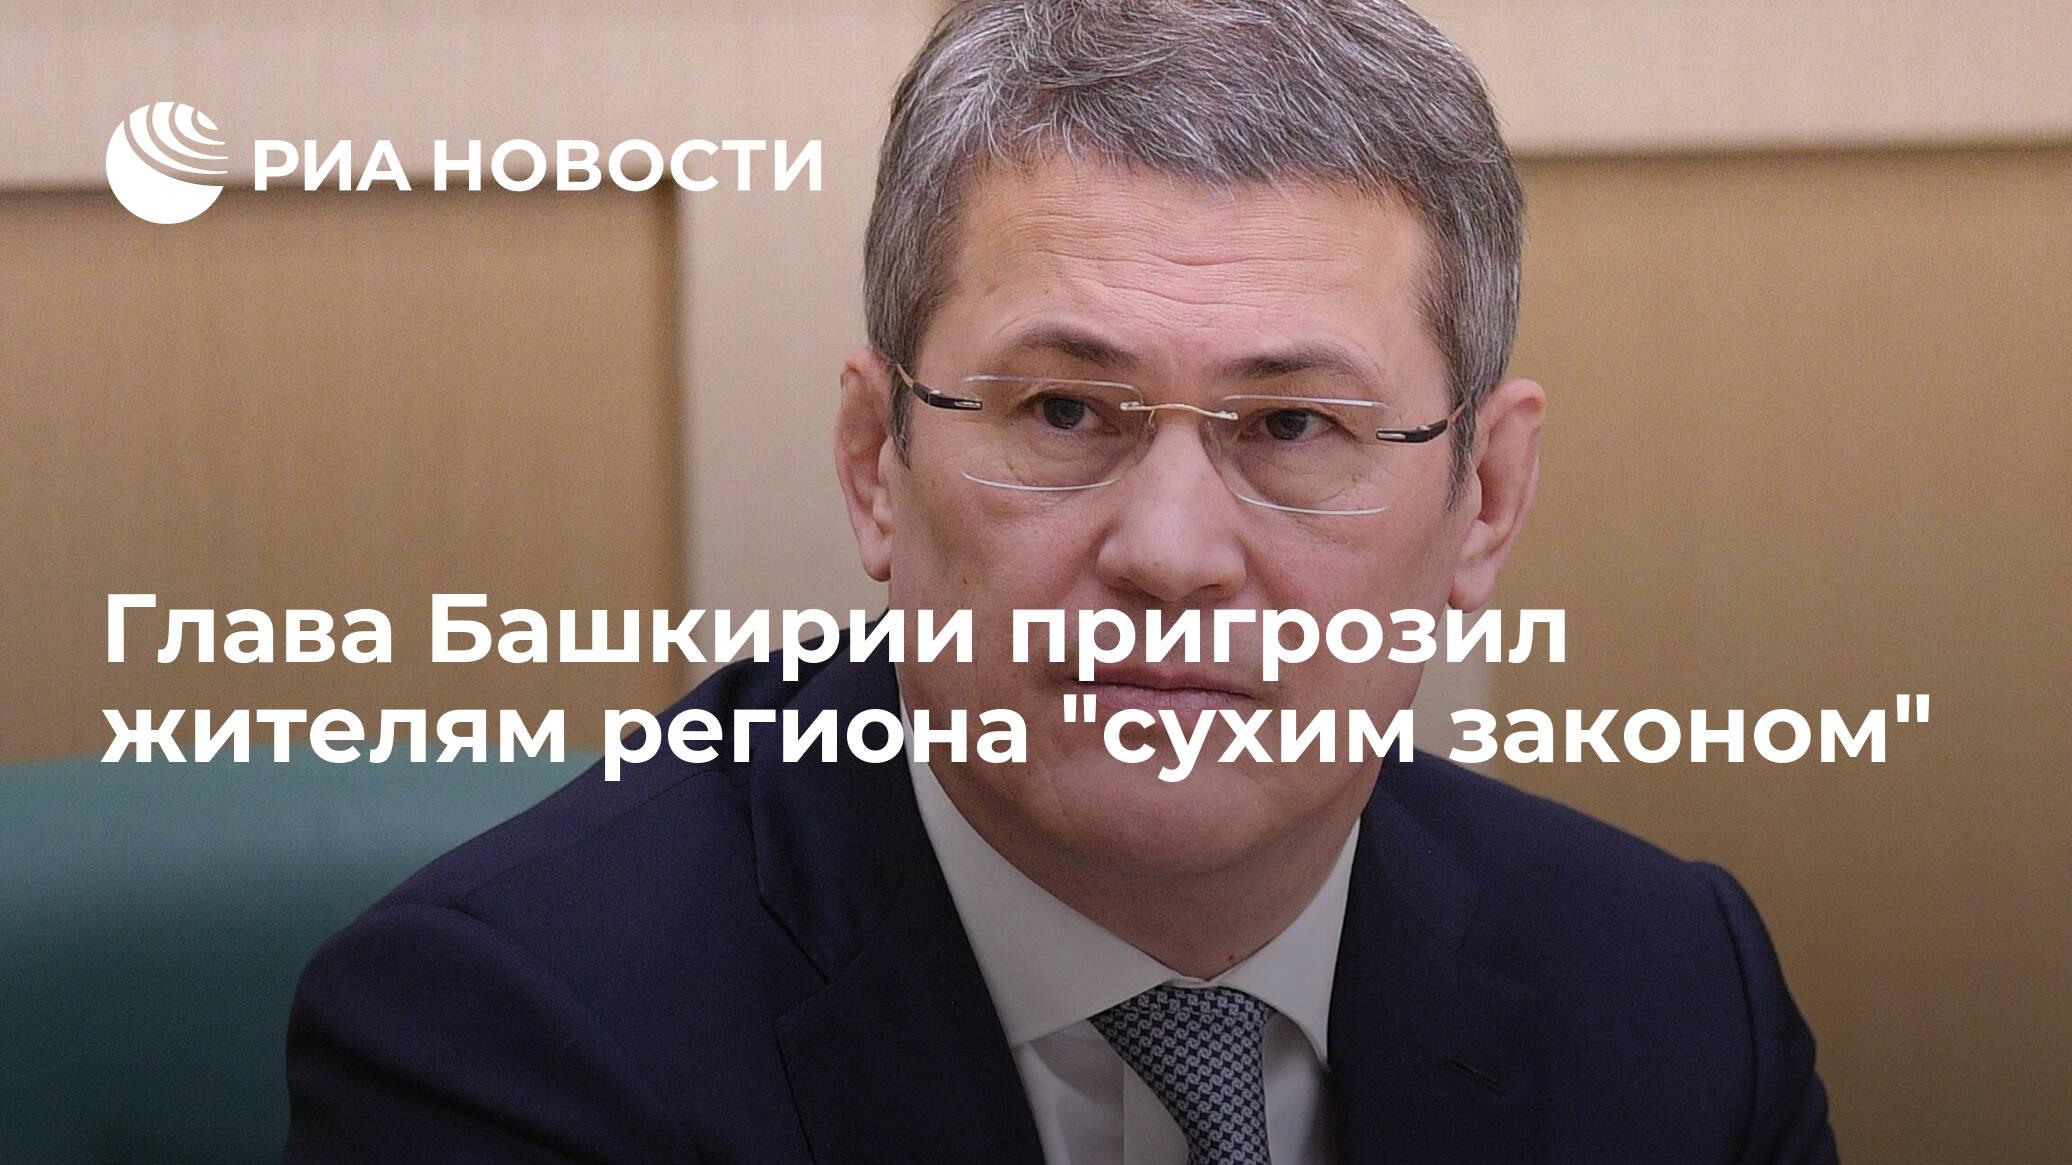 Глава Башкирии пригрозил жителям региона